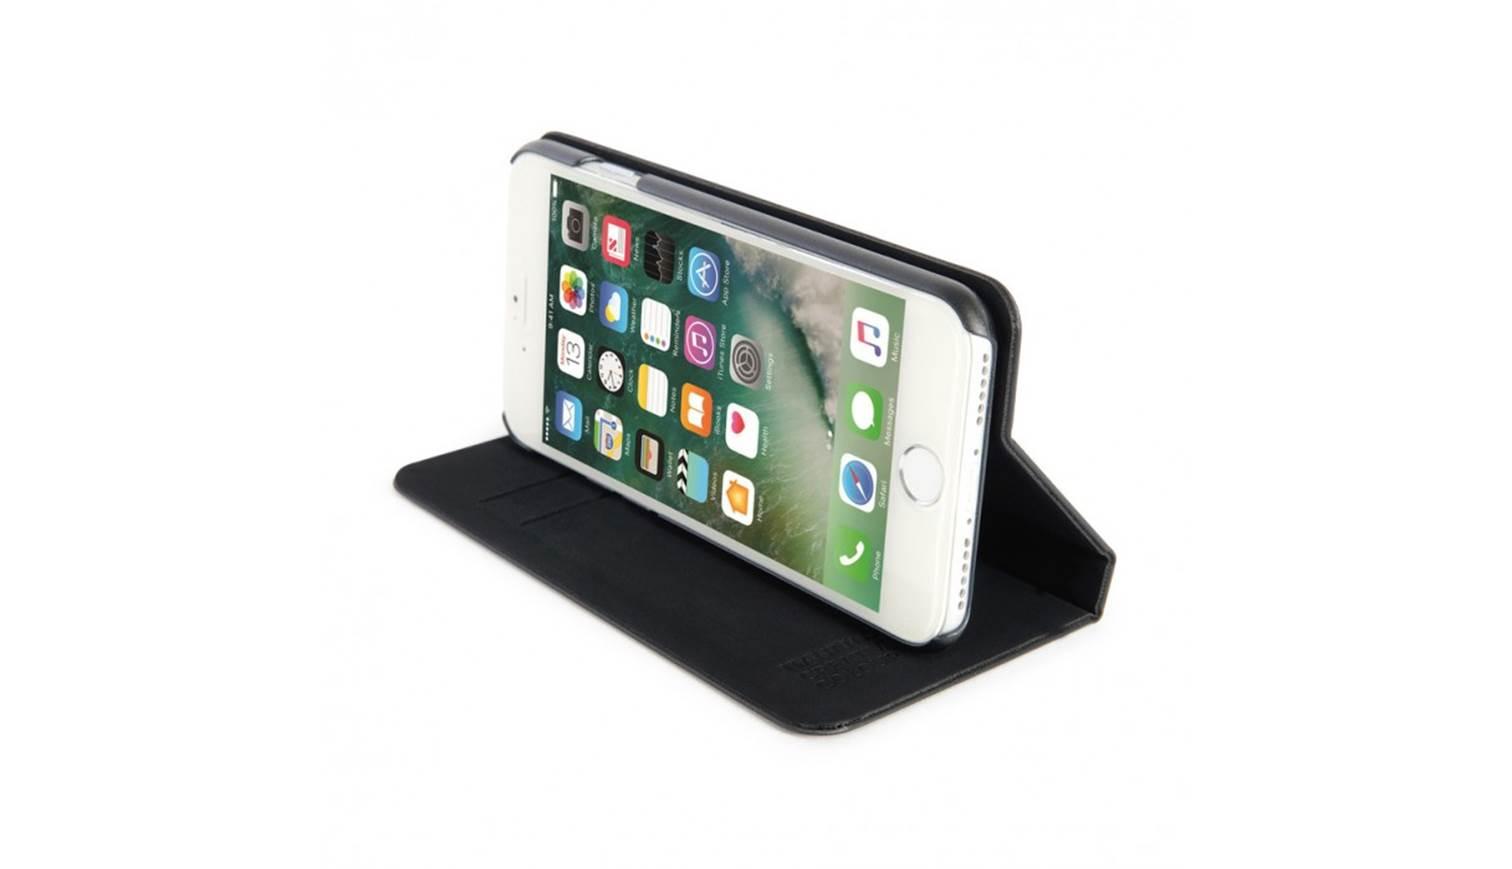 iphone 7 filo case